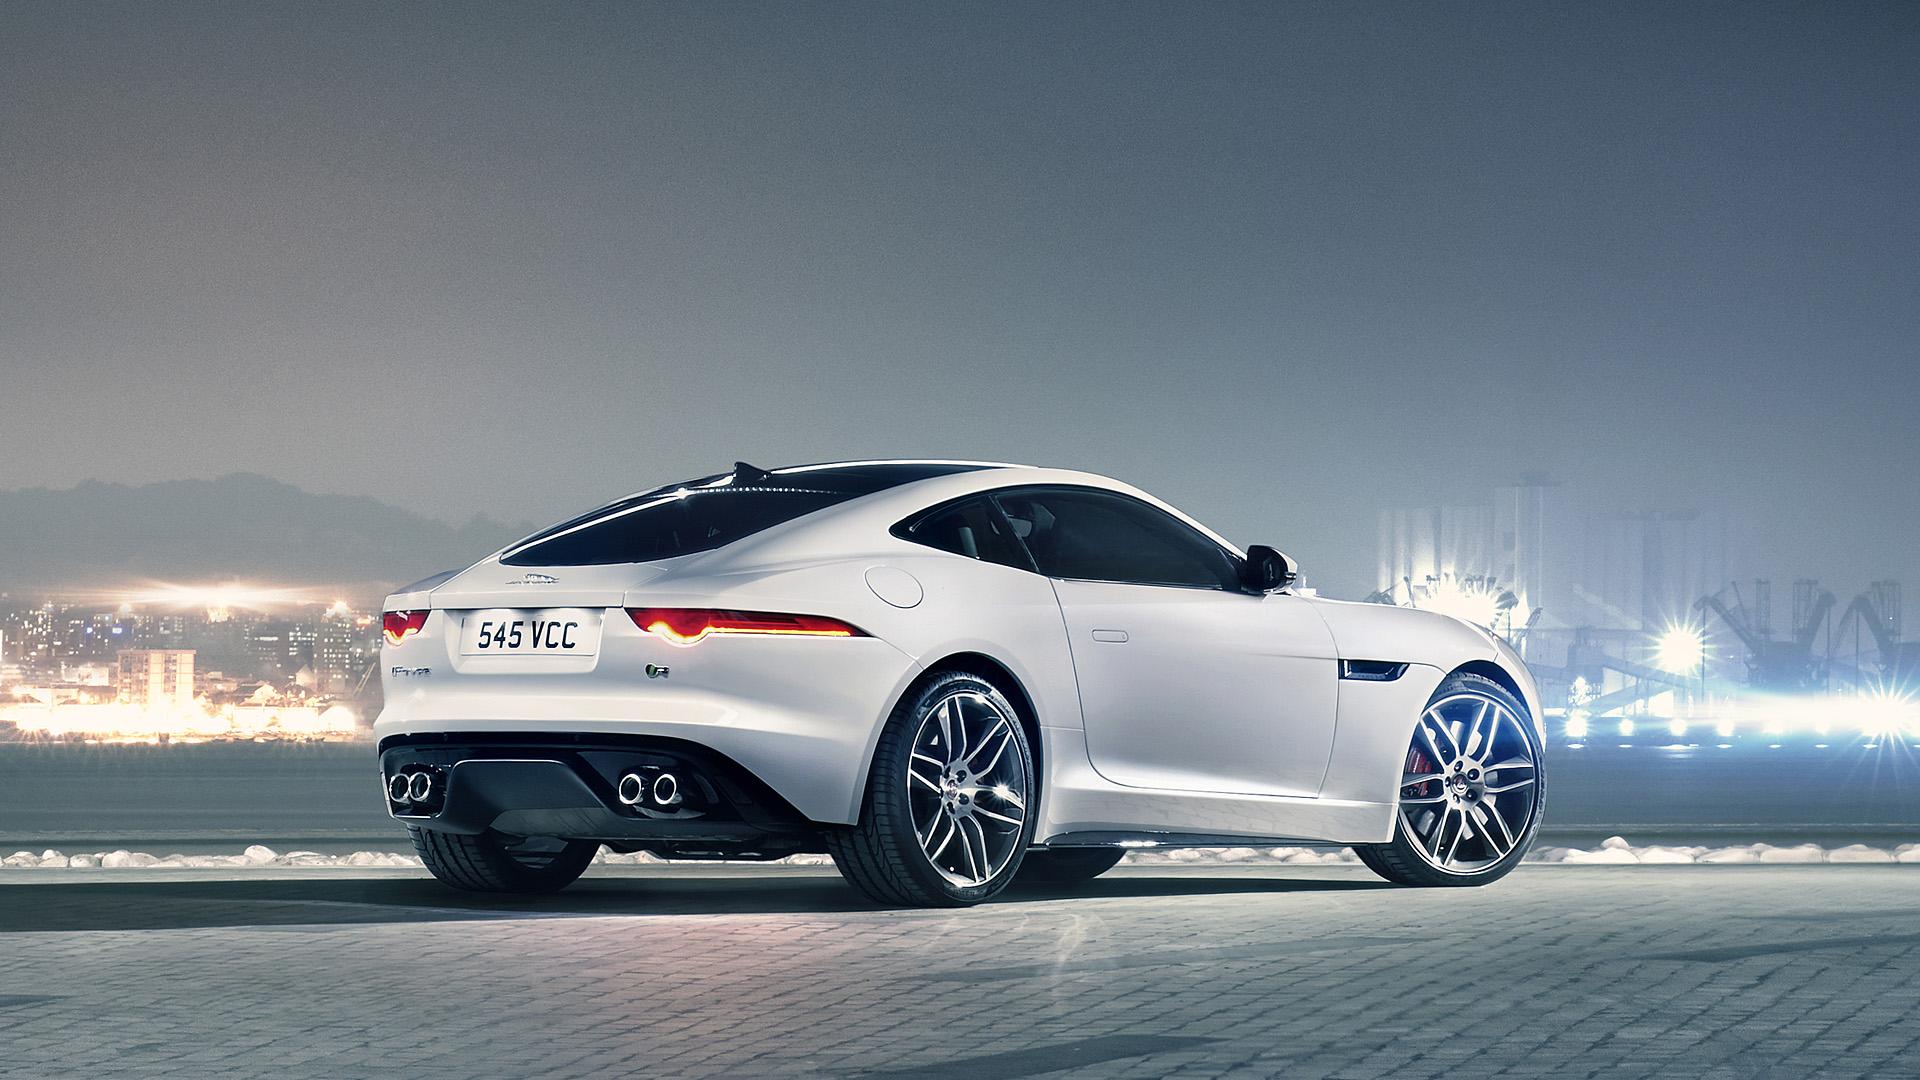 Hd wallpaper jaguar - Jaguar Cars Hd Wallpapers Pulse